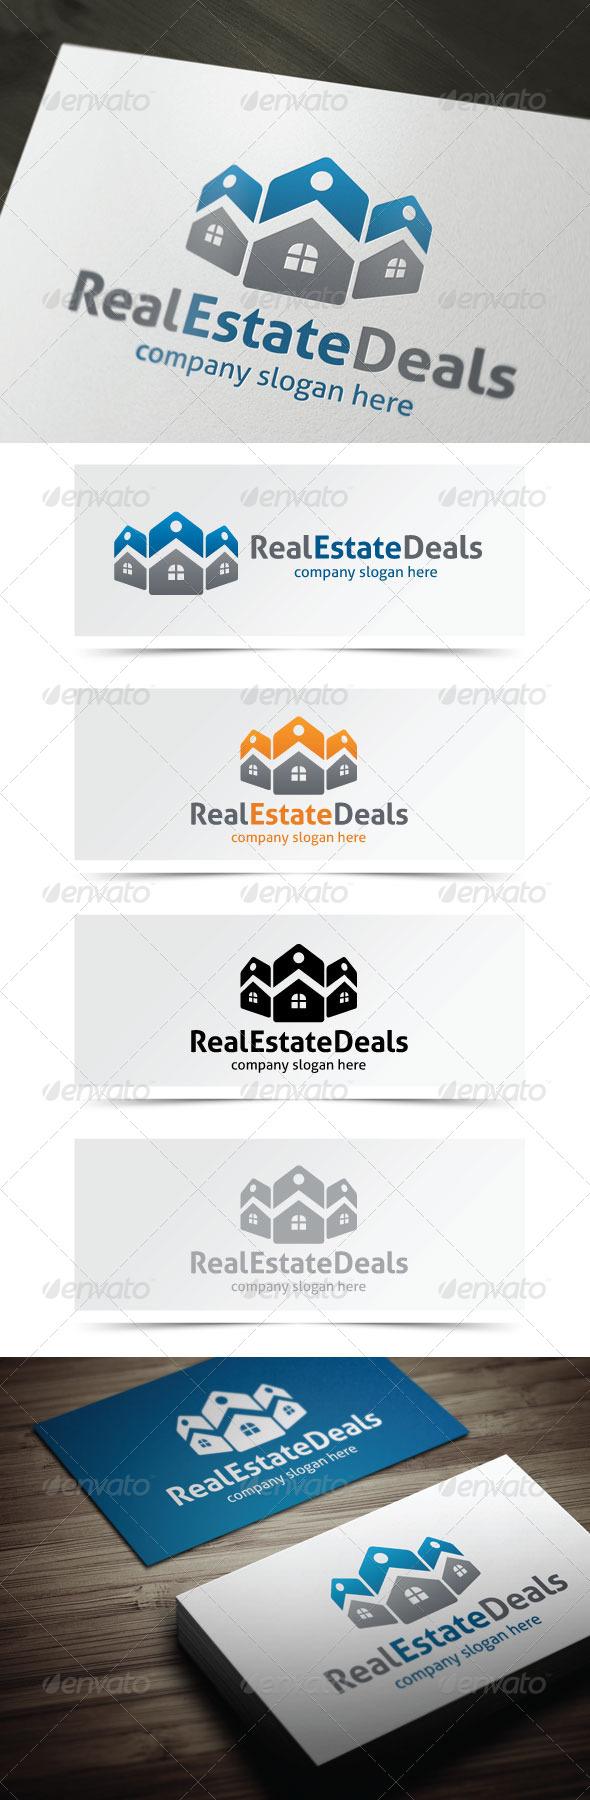 GraphicRiver Real Estate Deals 5355935